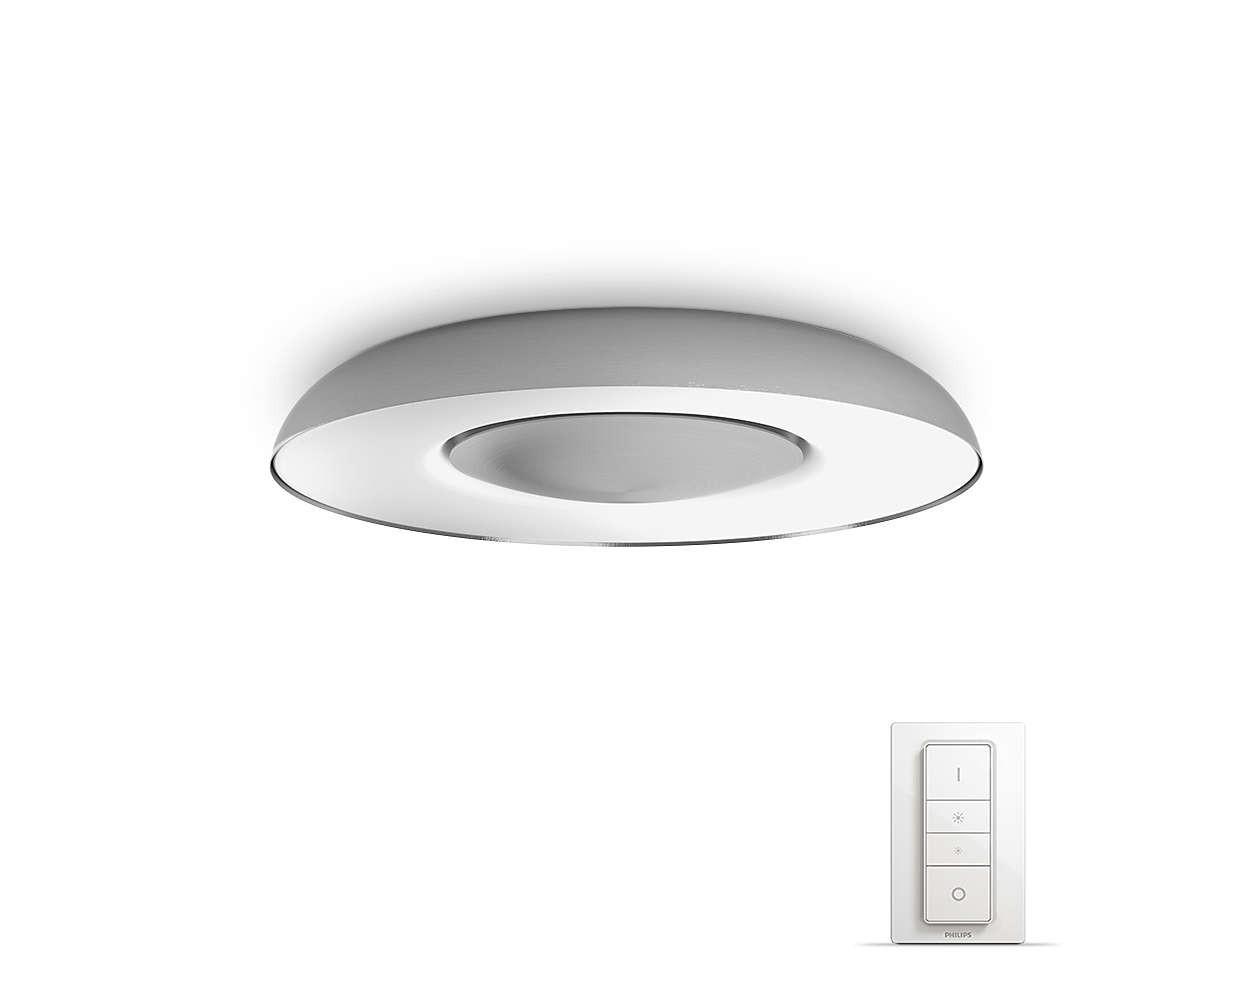 Philips Hue Still LED Deckenleuchte 2400lm inkl. Dimmschalter-Silver